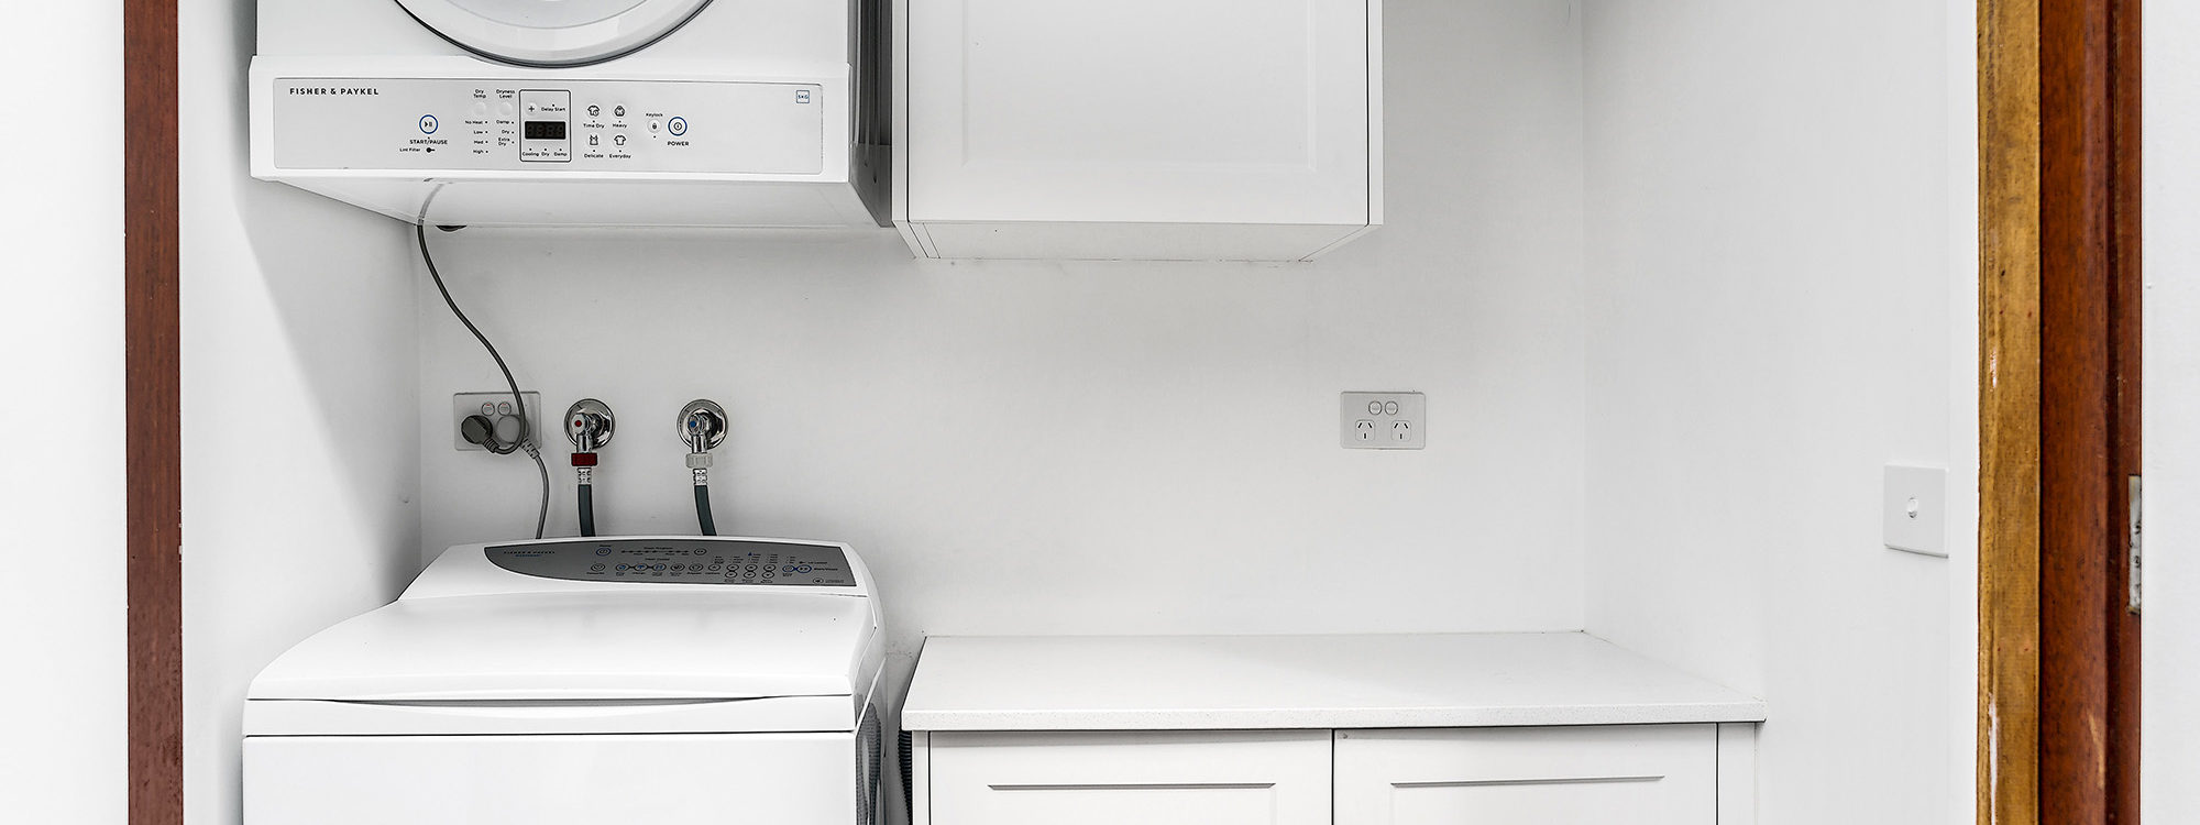 Bahari Studio - Byron Bay - Laundry